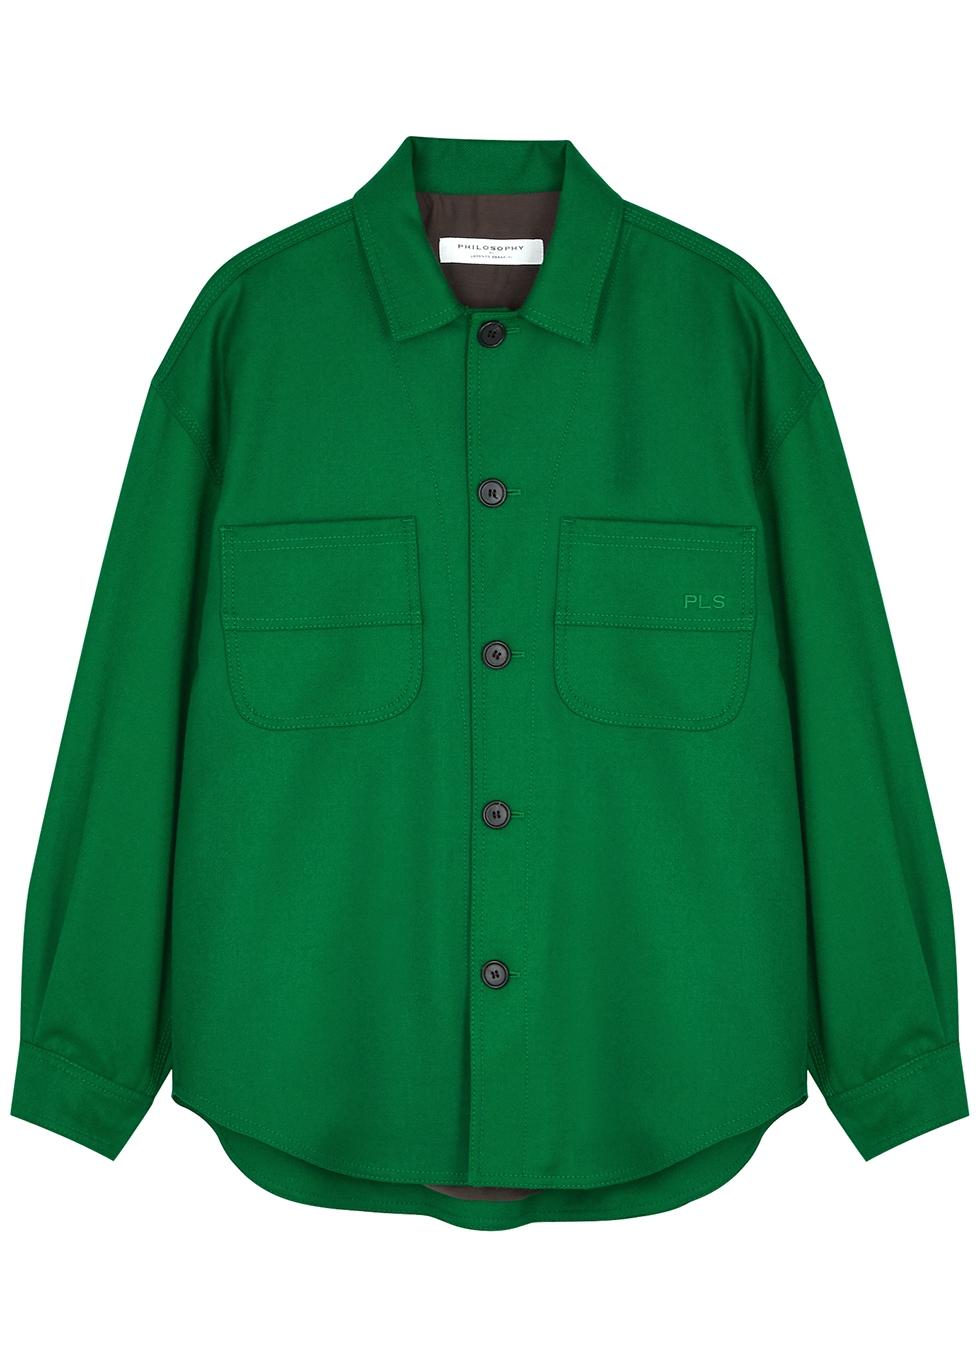 Green wool shirt jacket